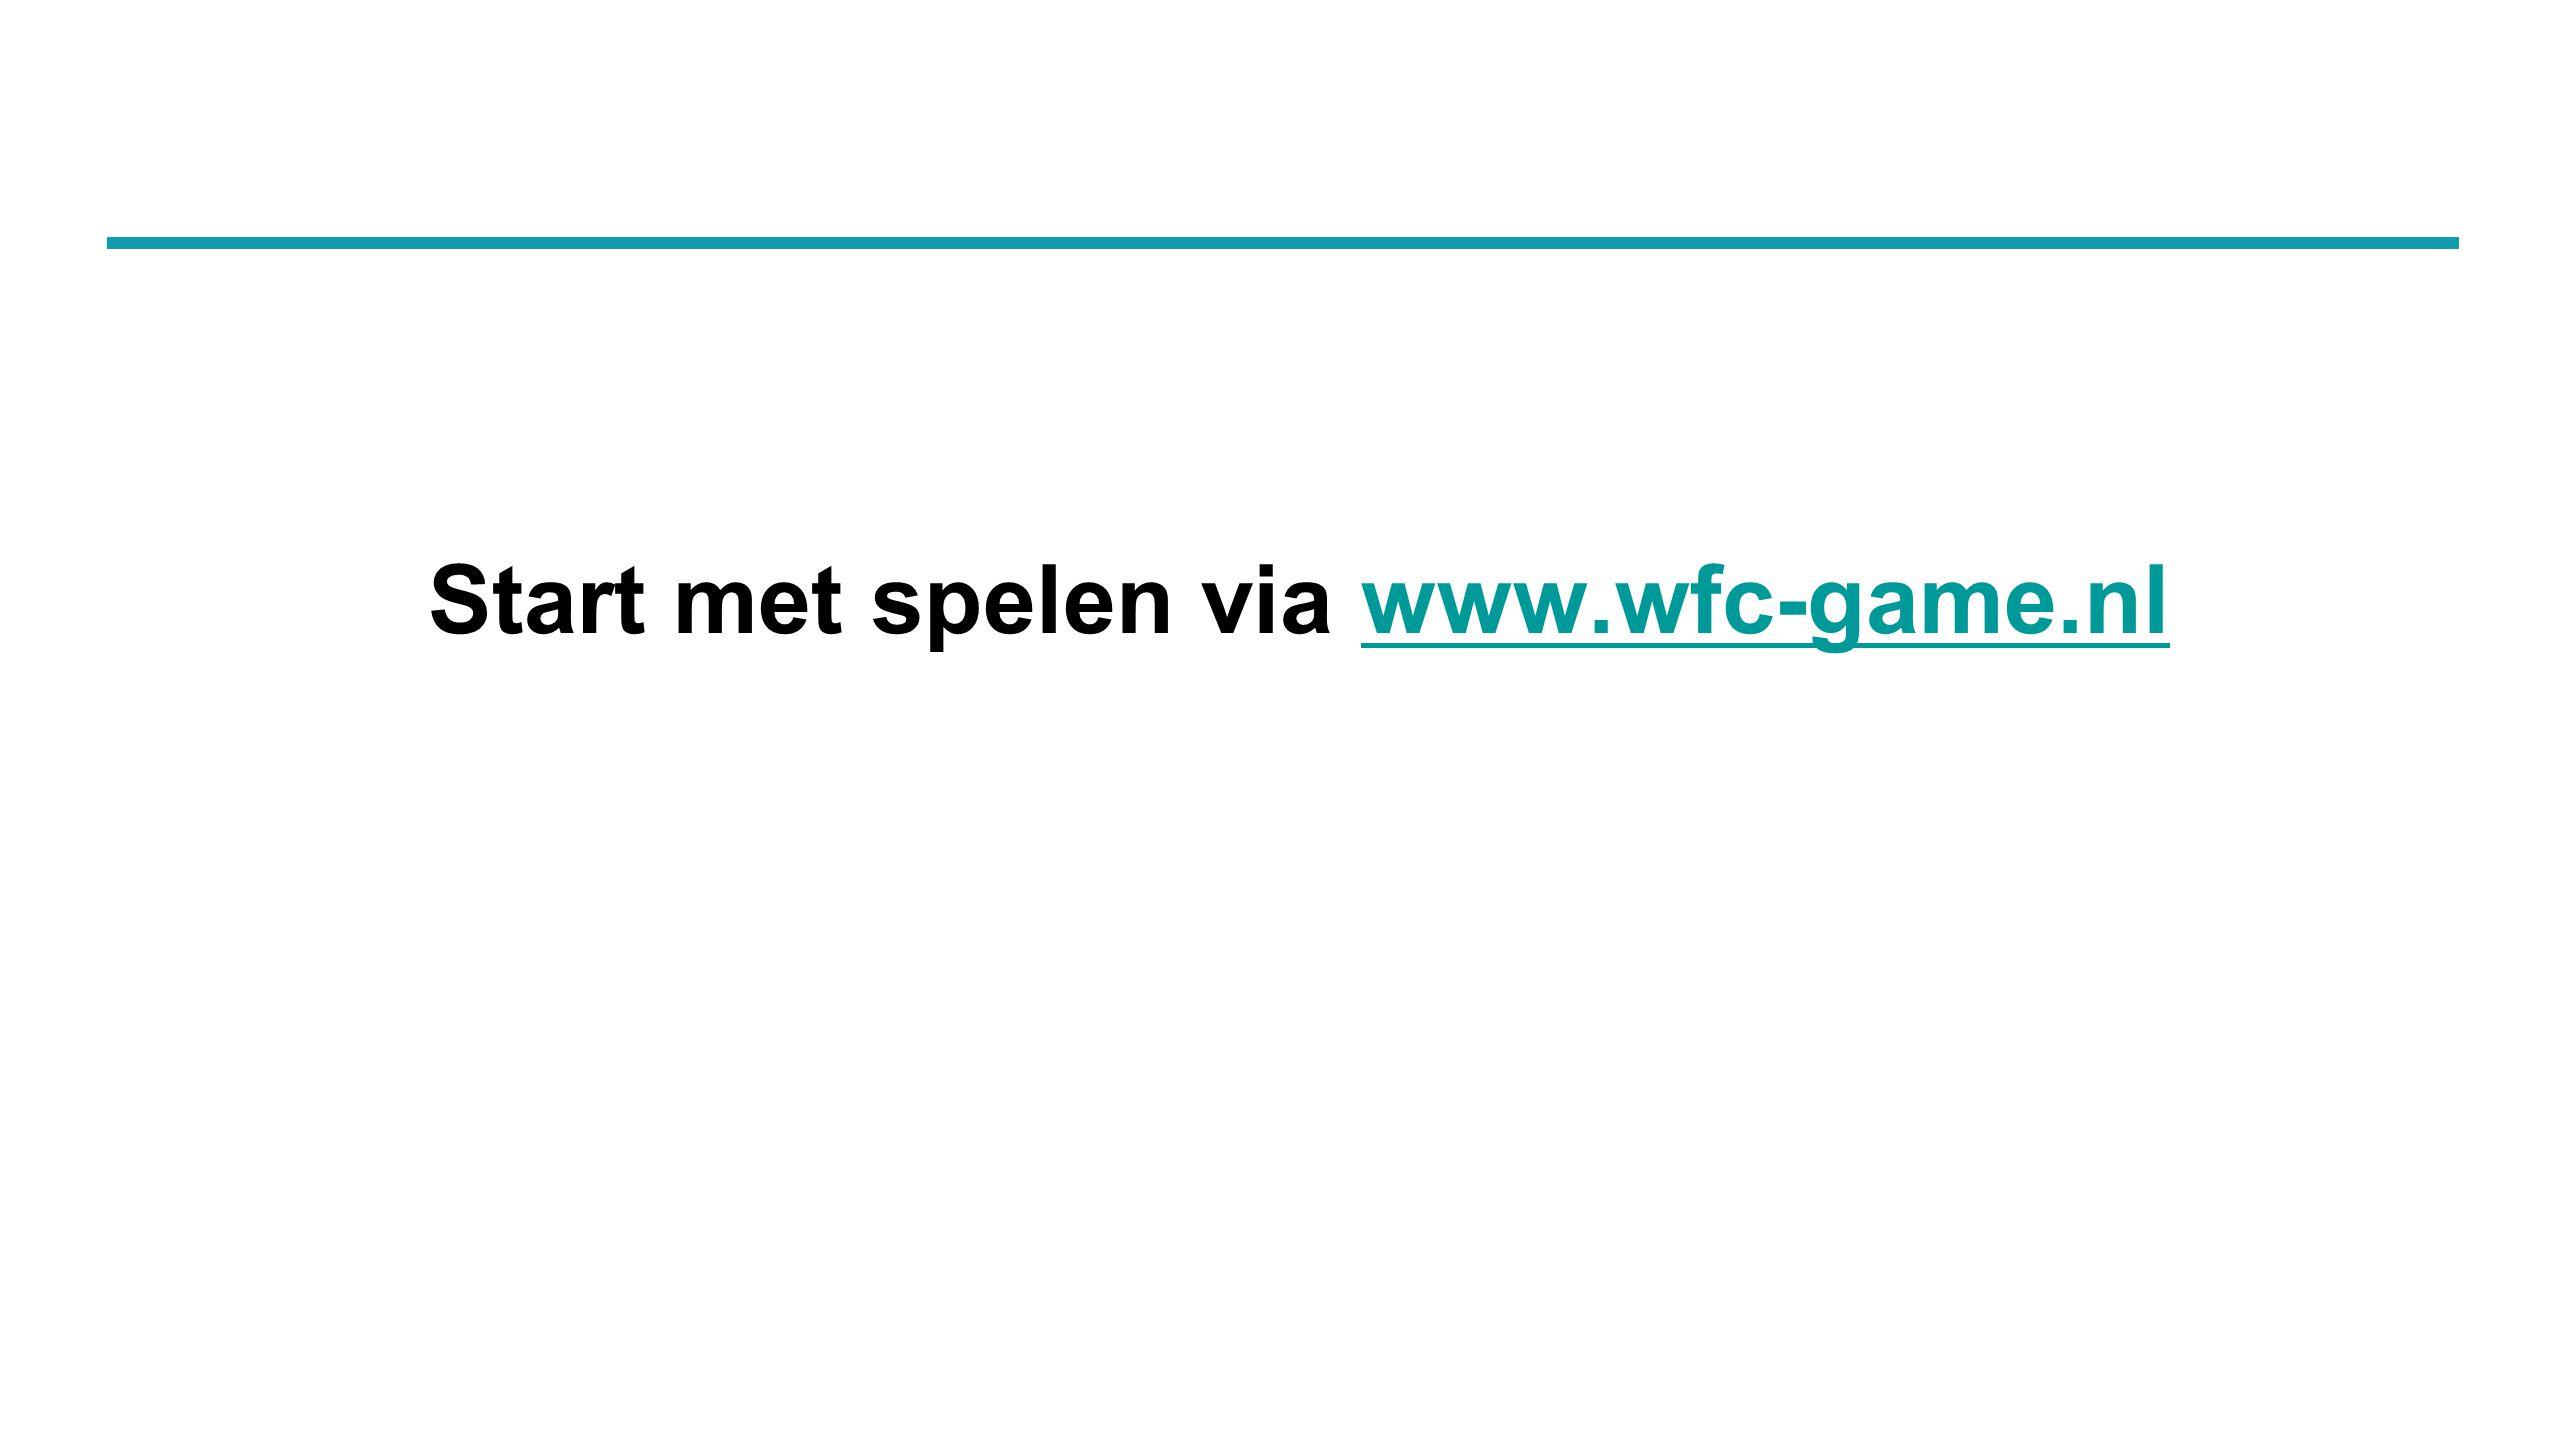 Start met spelen via www.wfc-game.nlwww.wfc-game.nl